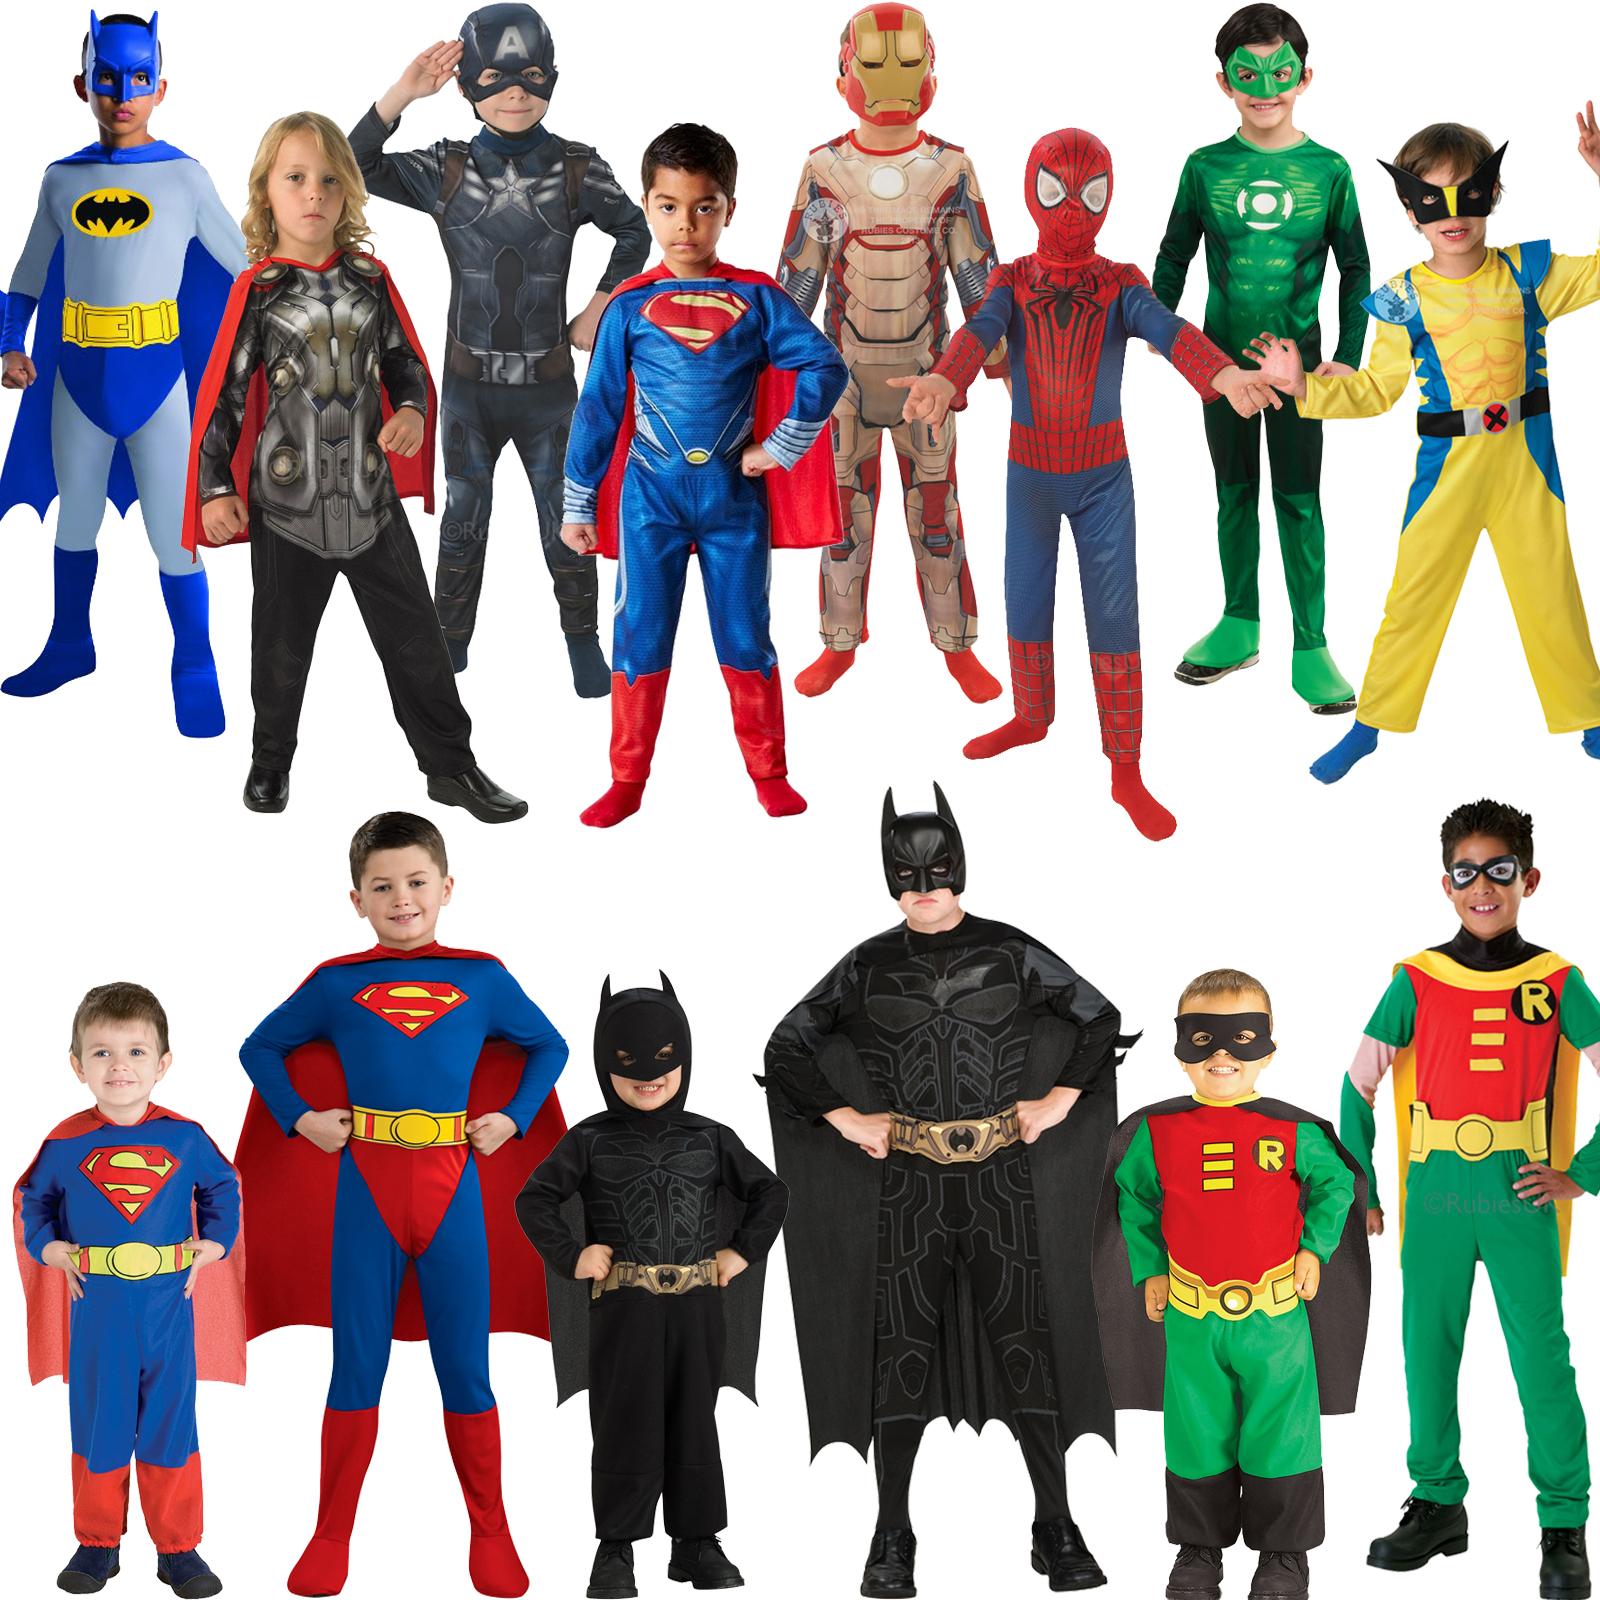 Licensed Childs Classic Superhero Fancy Dress New Costume